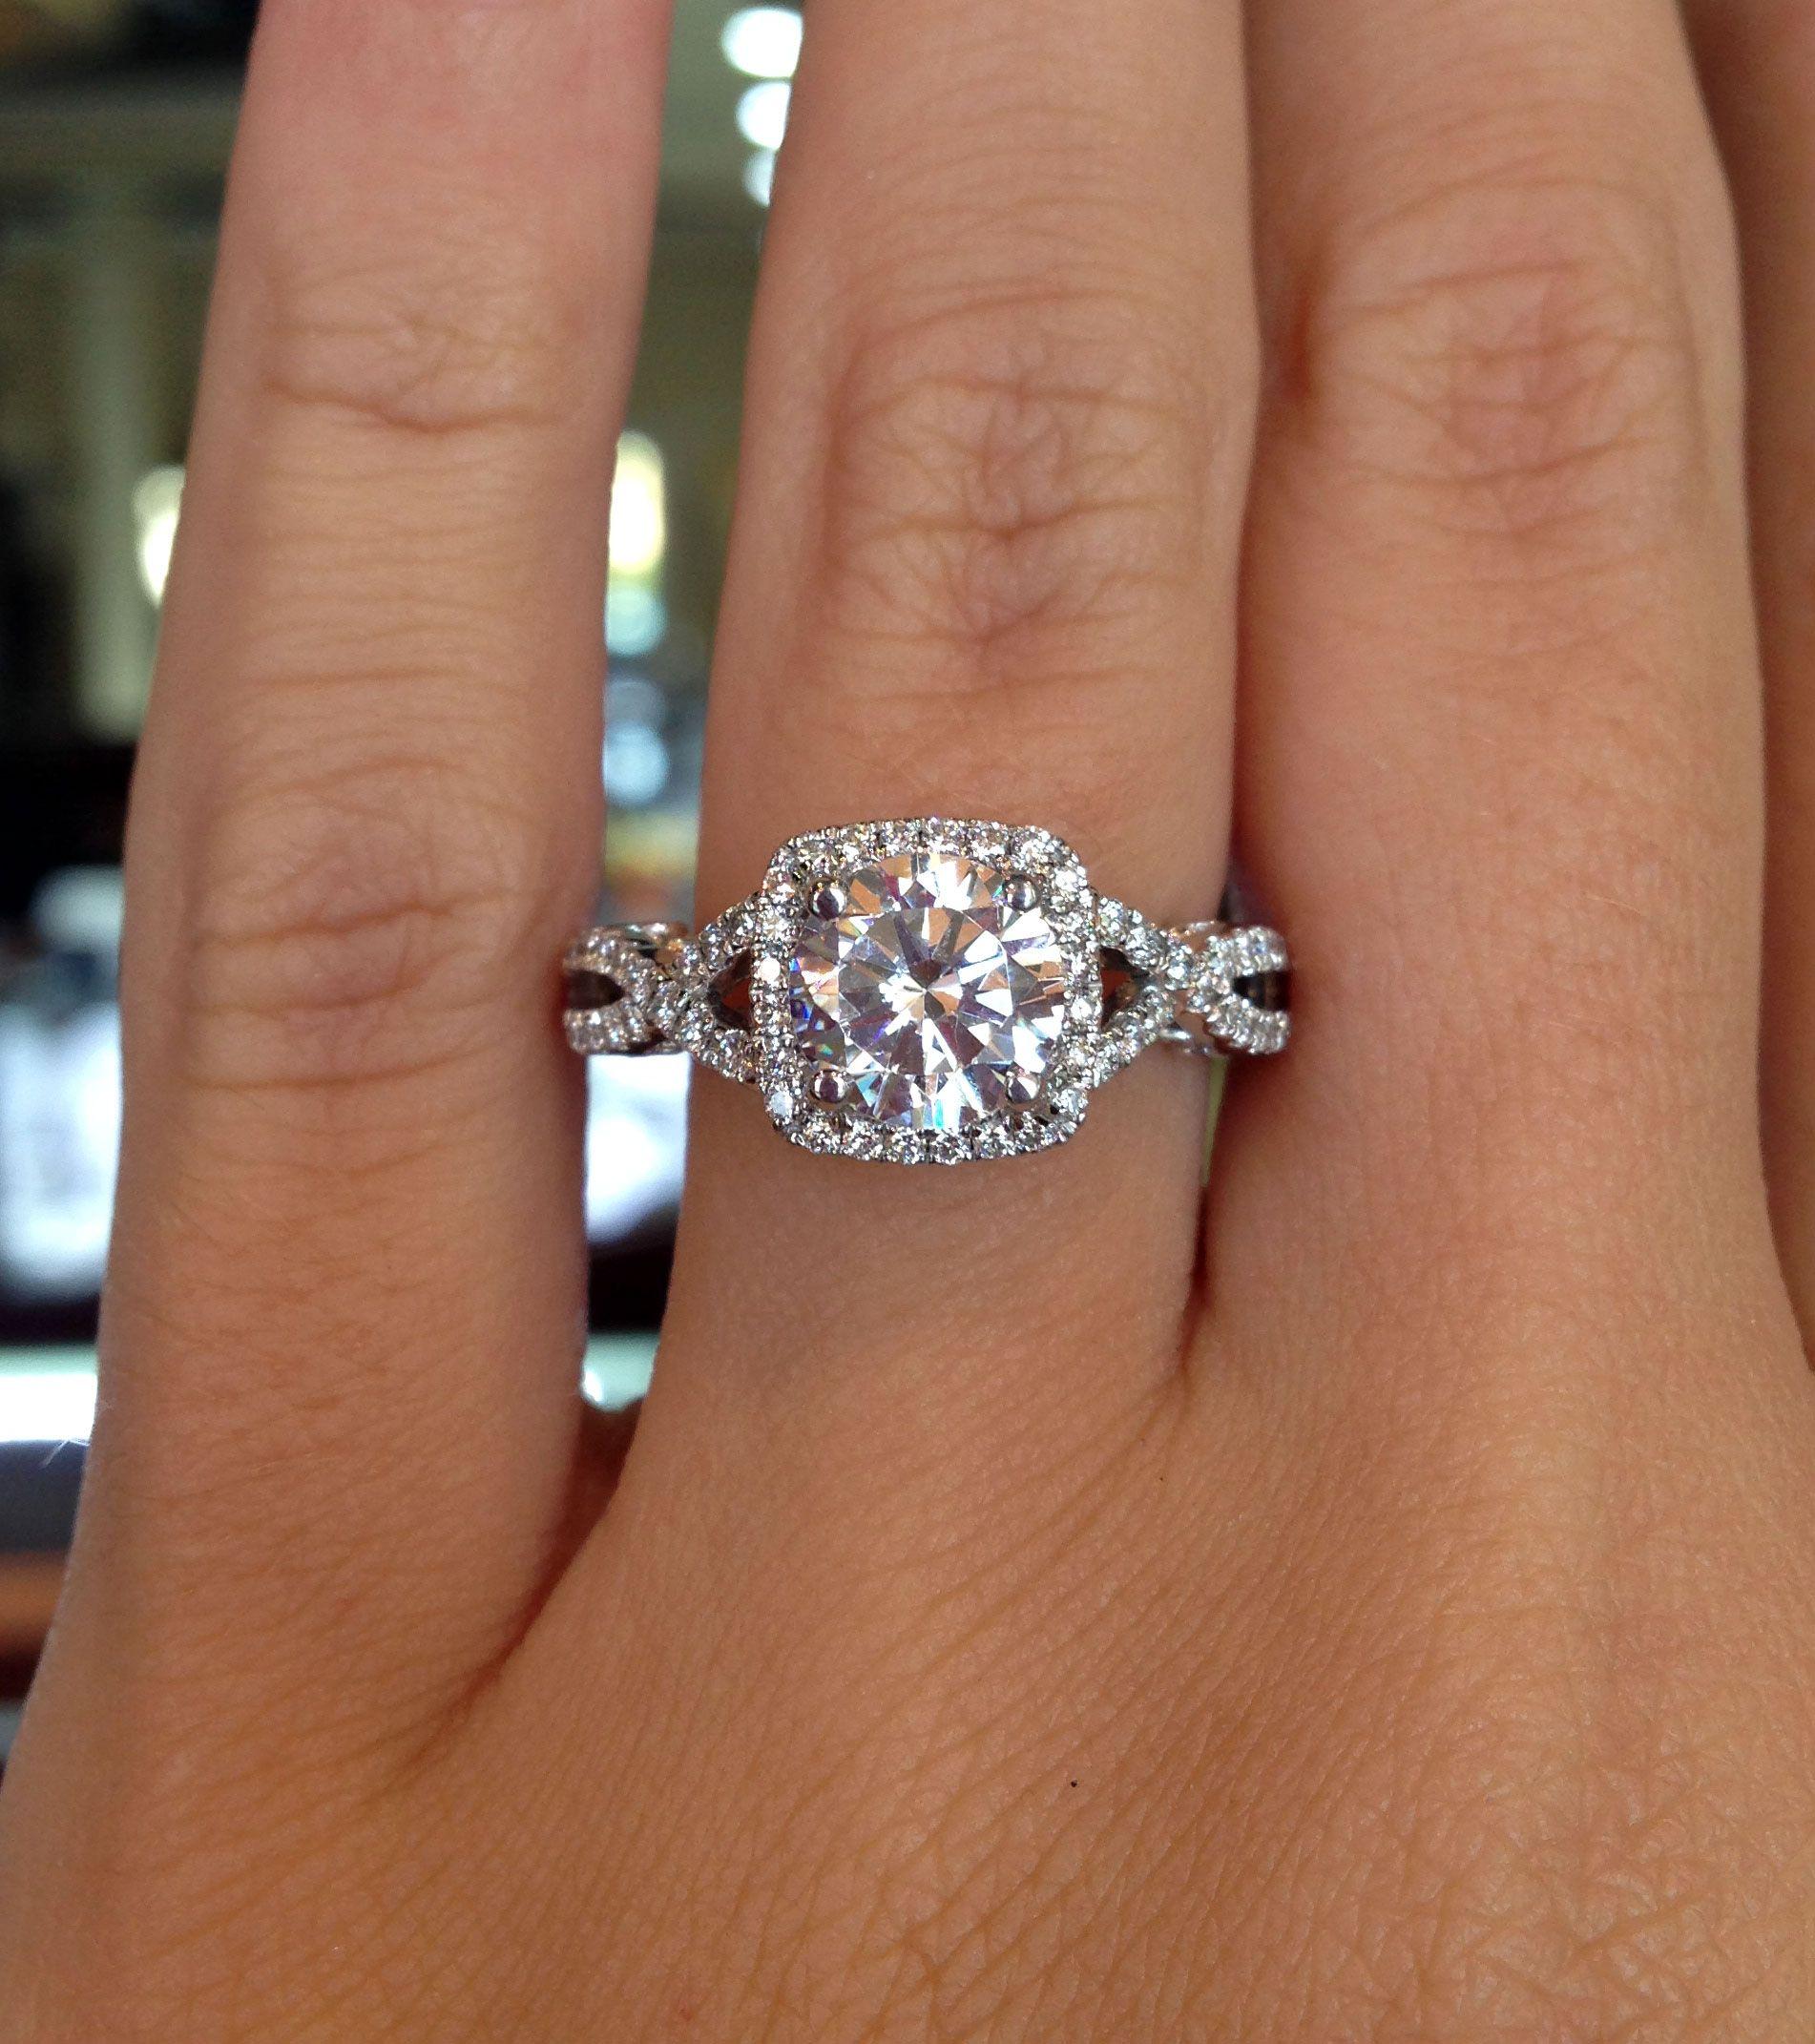 Verragio Engagement Rings 0.45ctw Diamond Setting